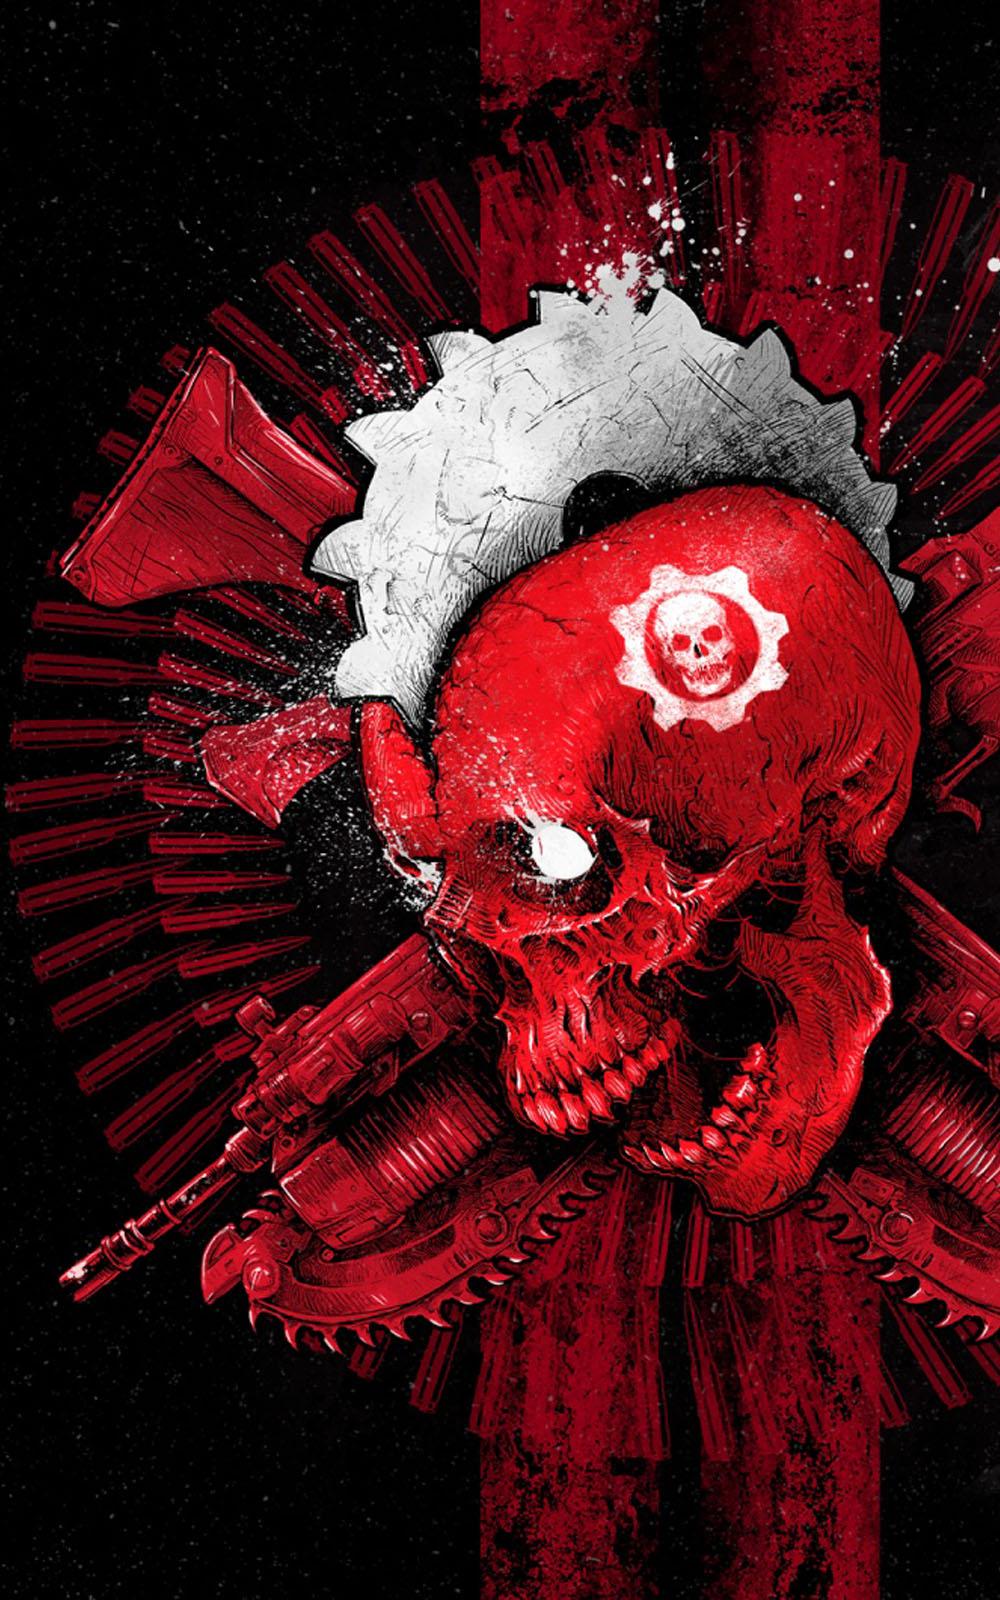 Gears Of War 4 Godmachine Download Free 100 Pure Hd